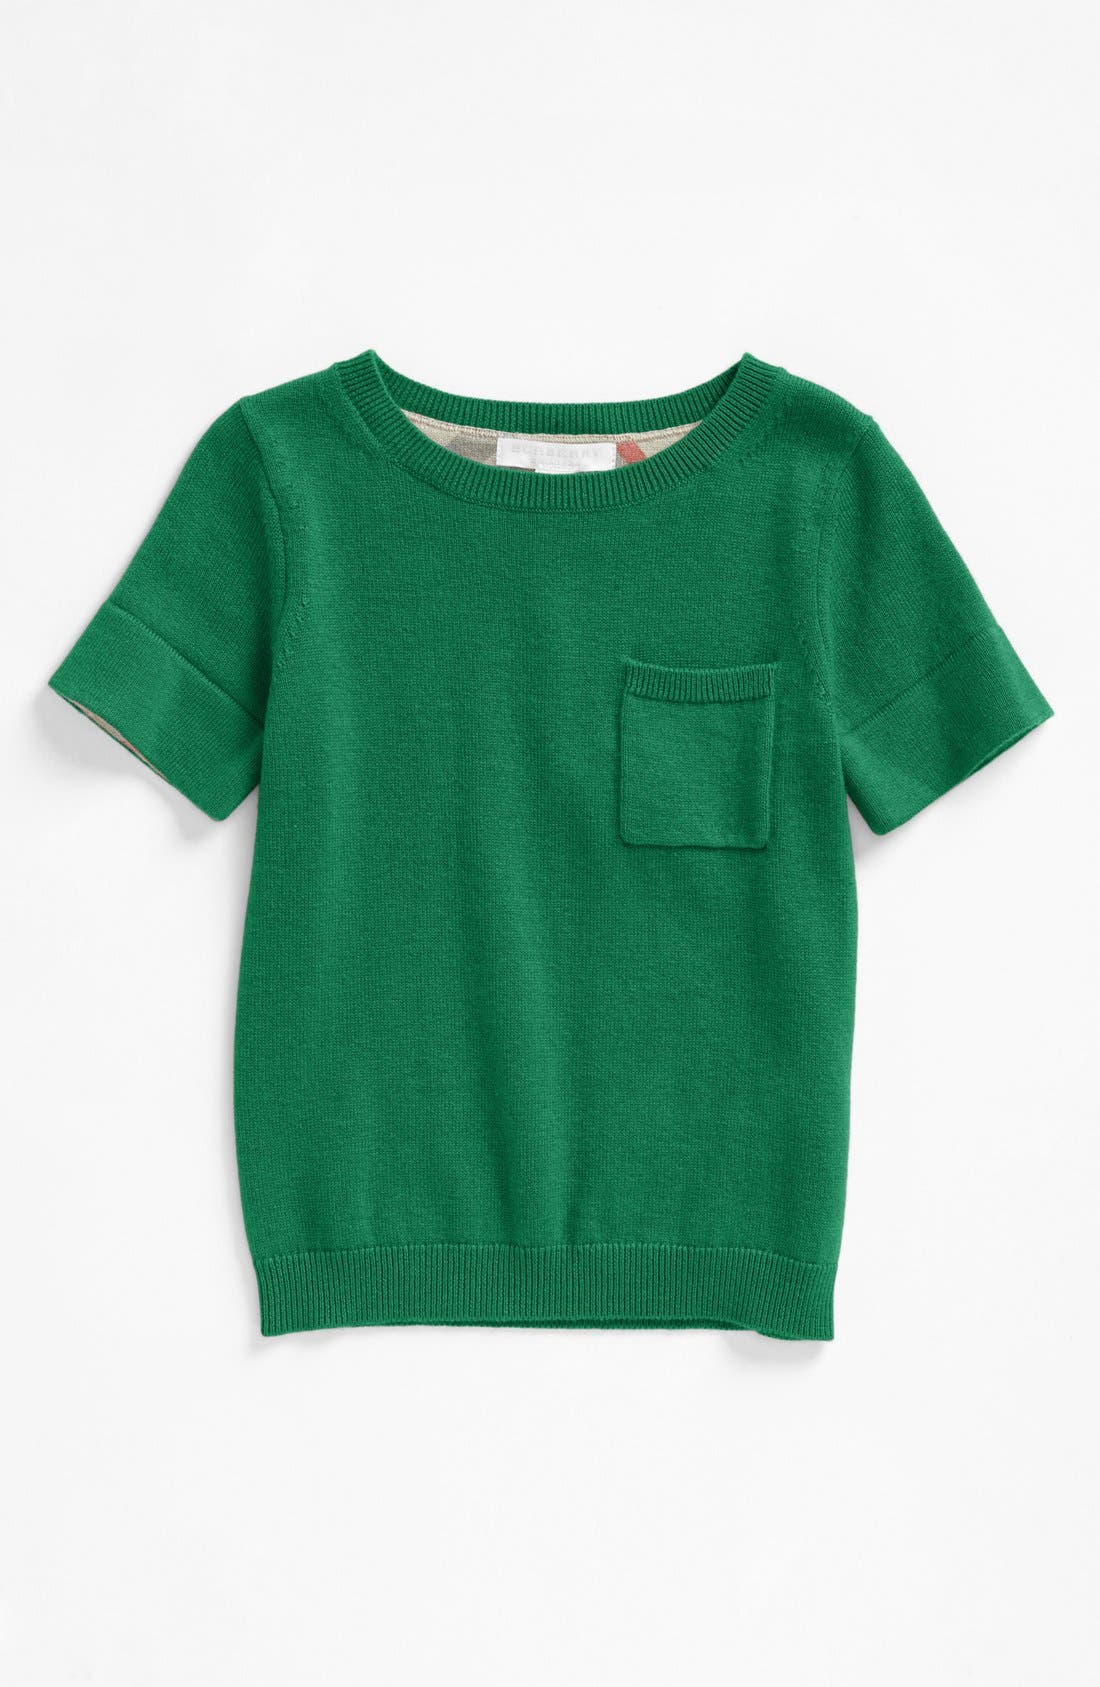 Main Image - Burberry 'Talie' Sweater (Little Girls & Big Girls)